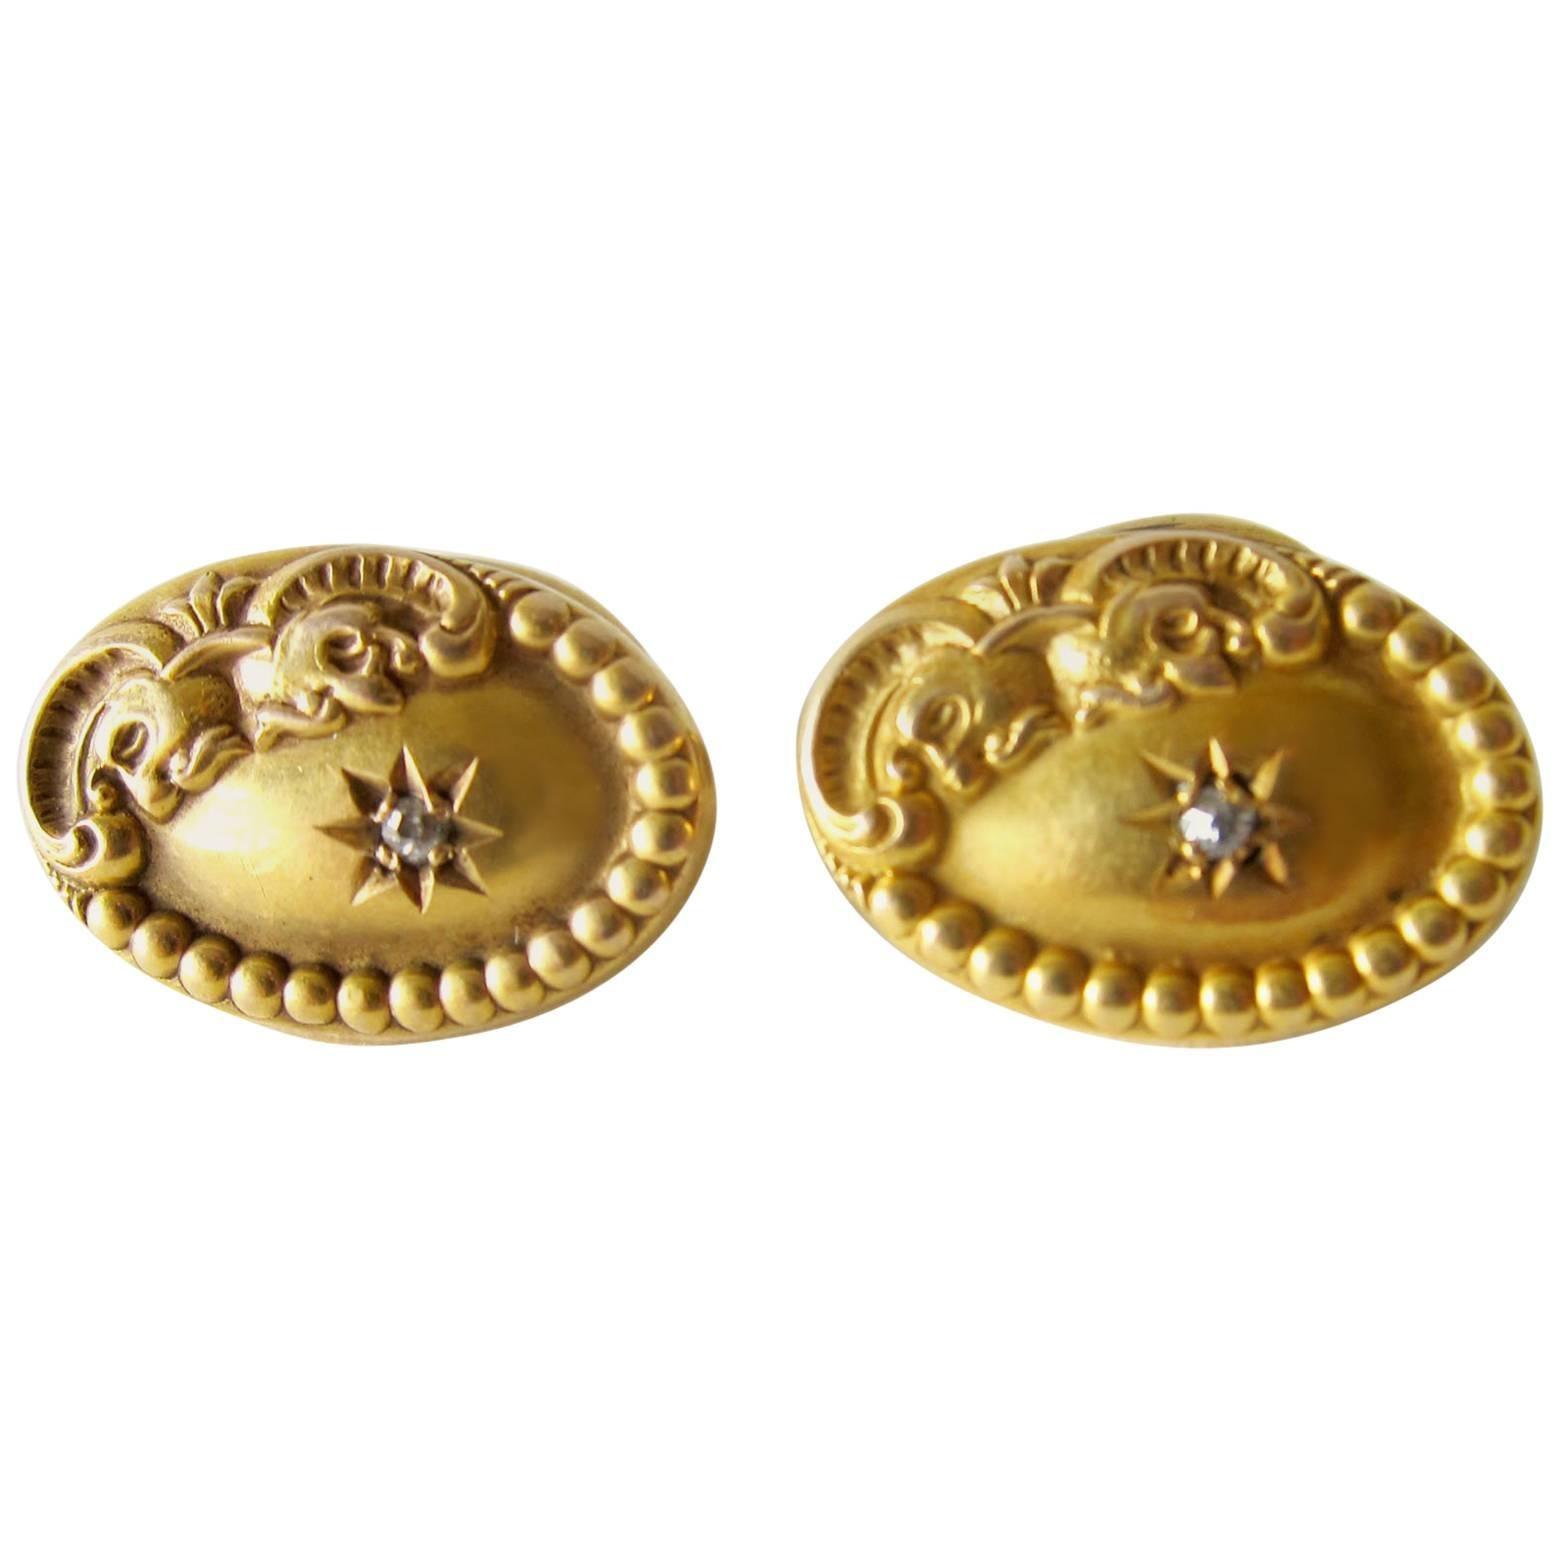 Victorian 10k Gold Diamond Ornate Oval Cufflinks